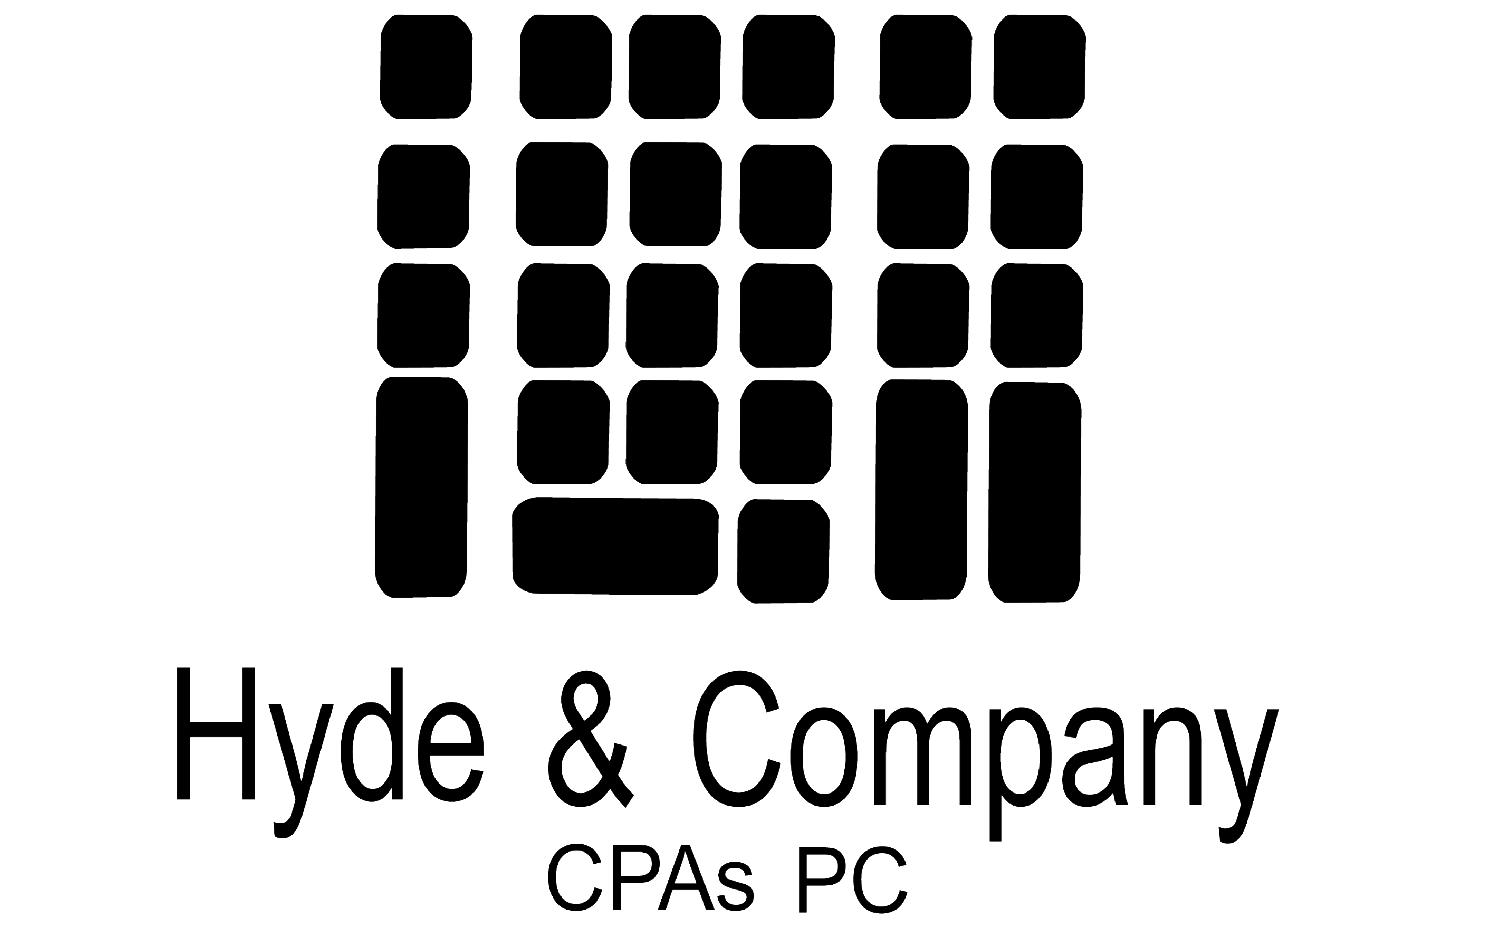 Hyde & Company CPAs, P.C.